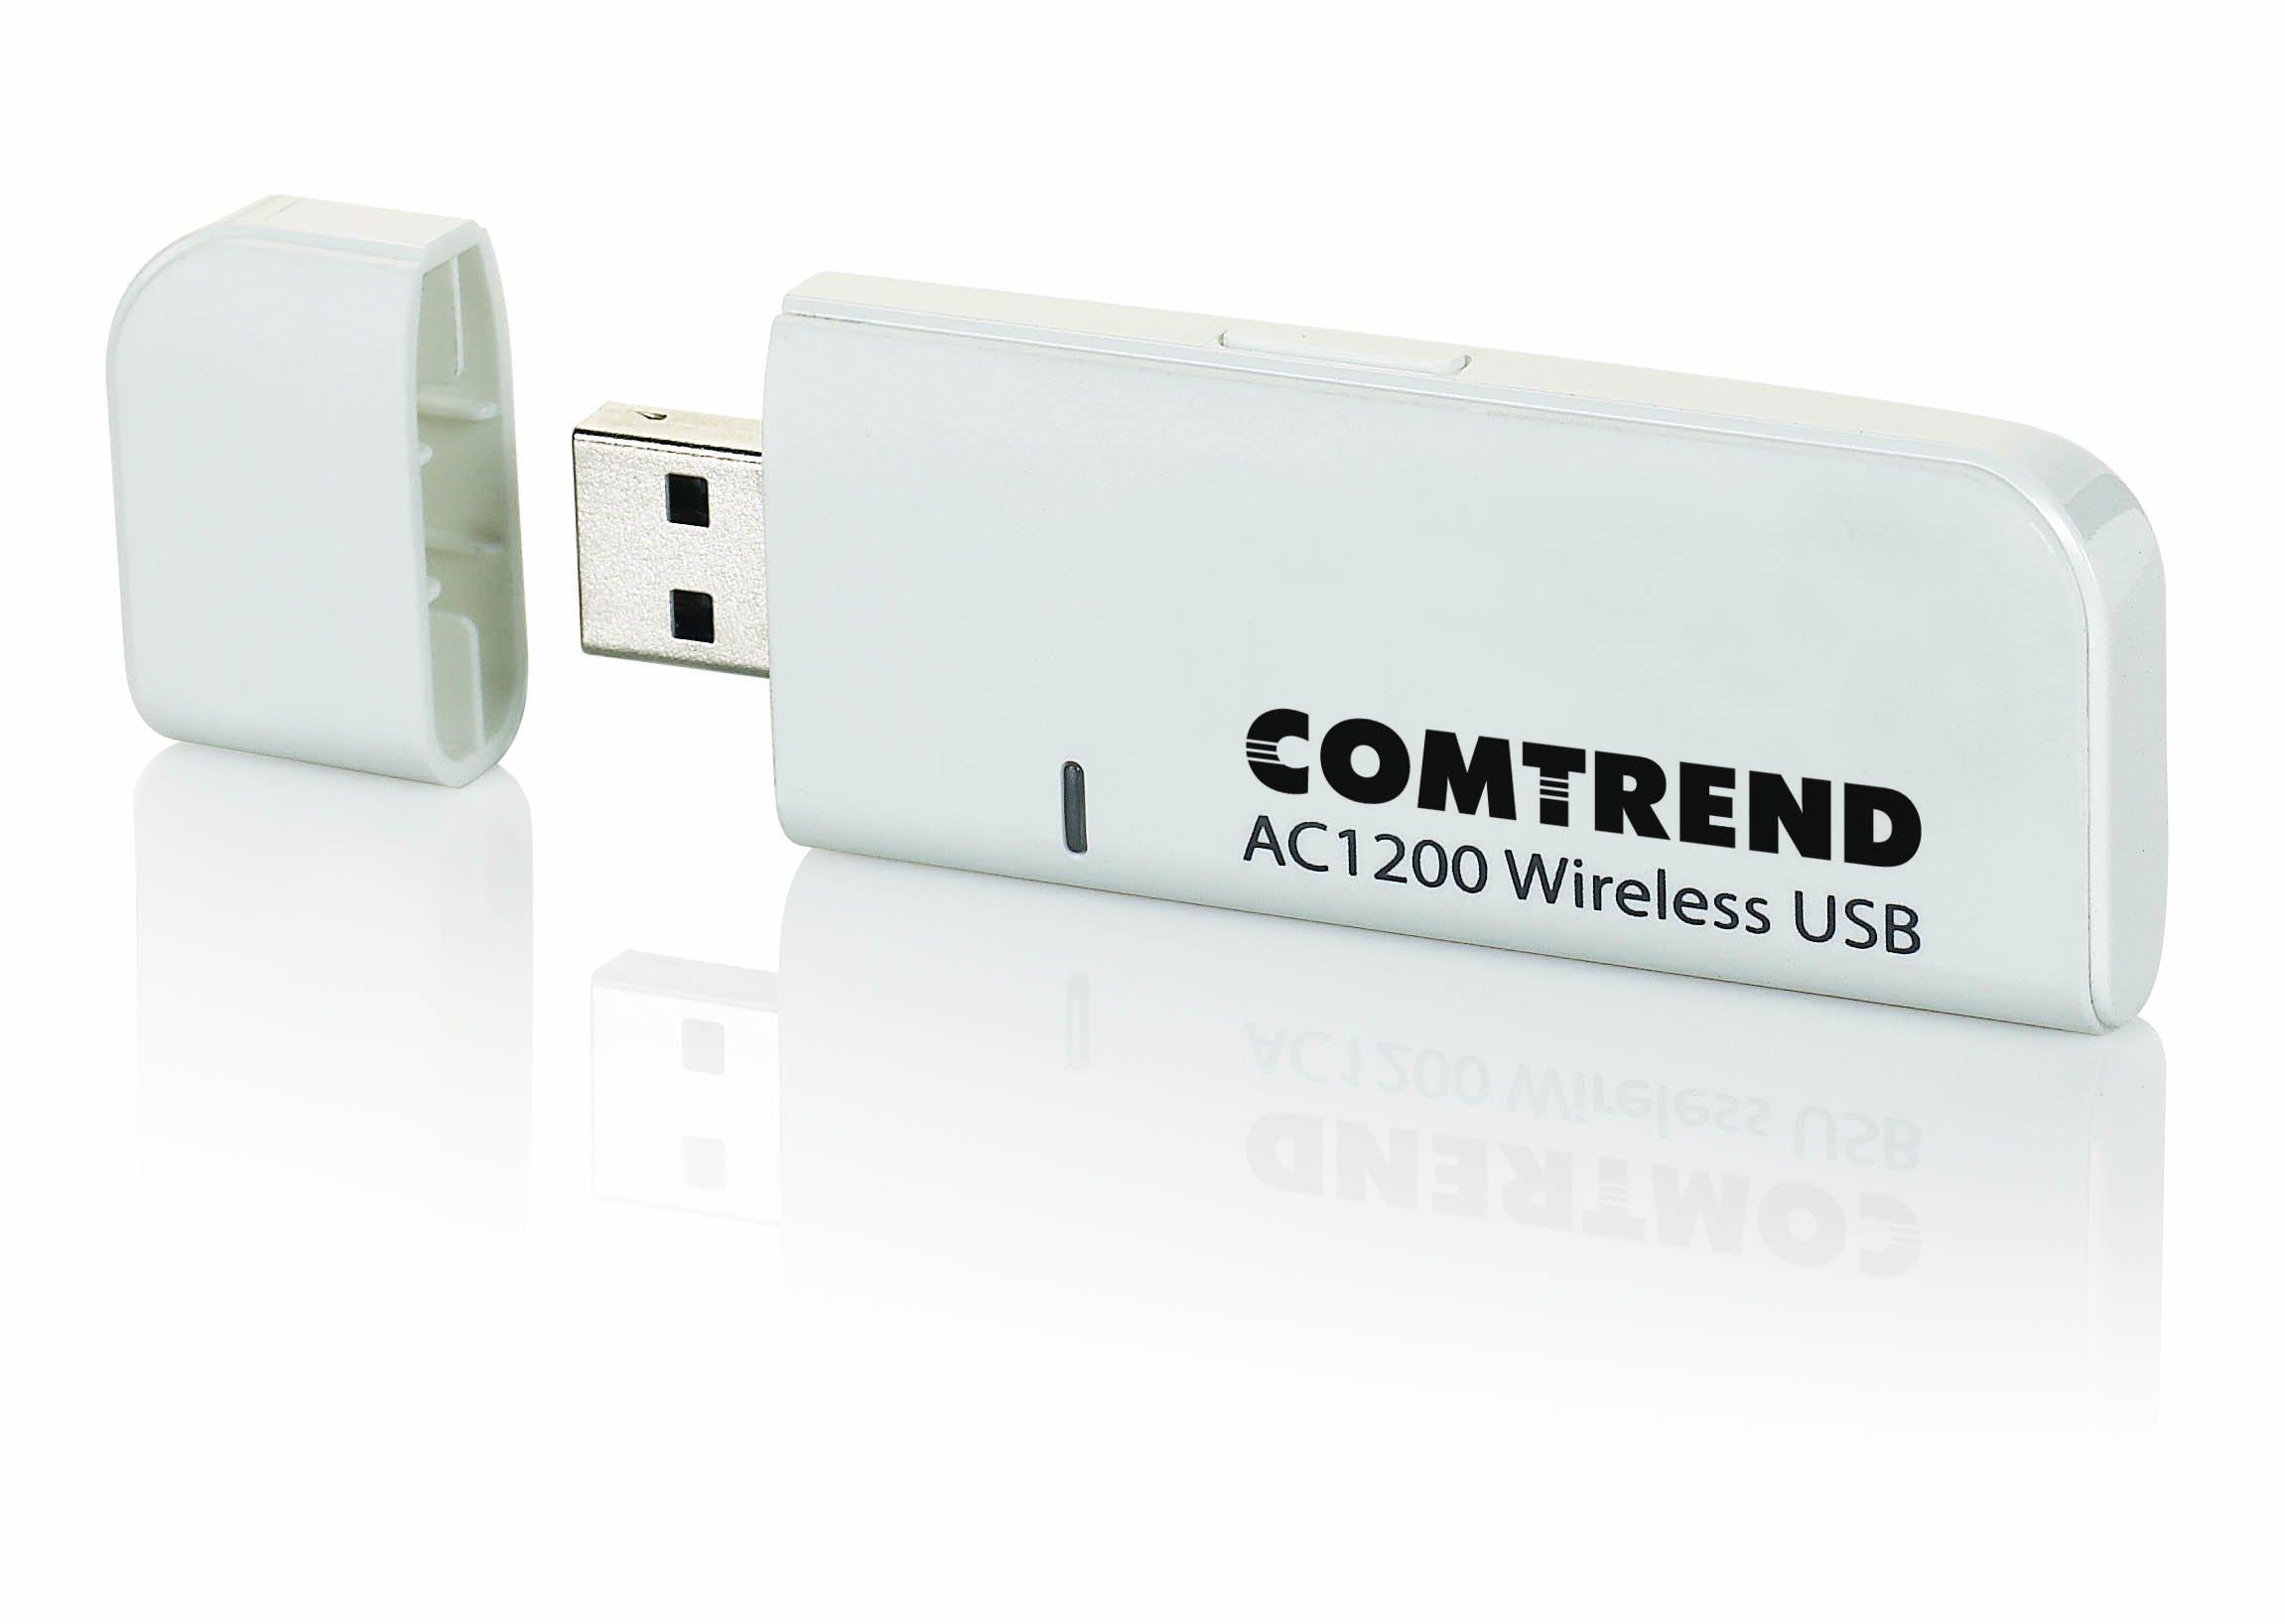 COMTREND WD-1030 Ac1200 Dual Band Wireless Usb 3.0 Adapter (Wd-1030), Next Generation Wi-Fi